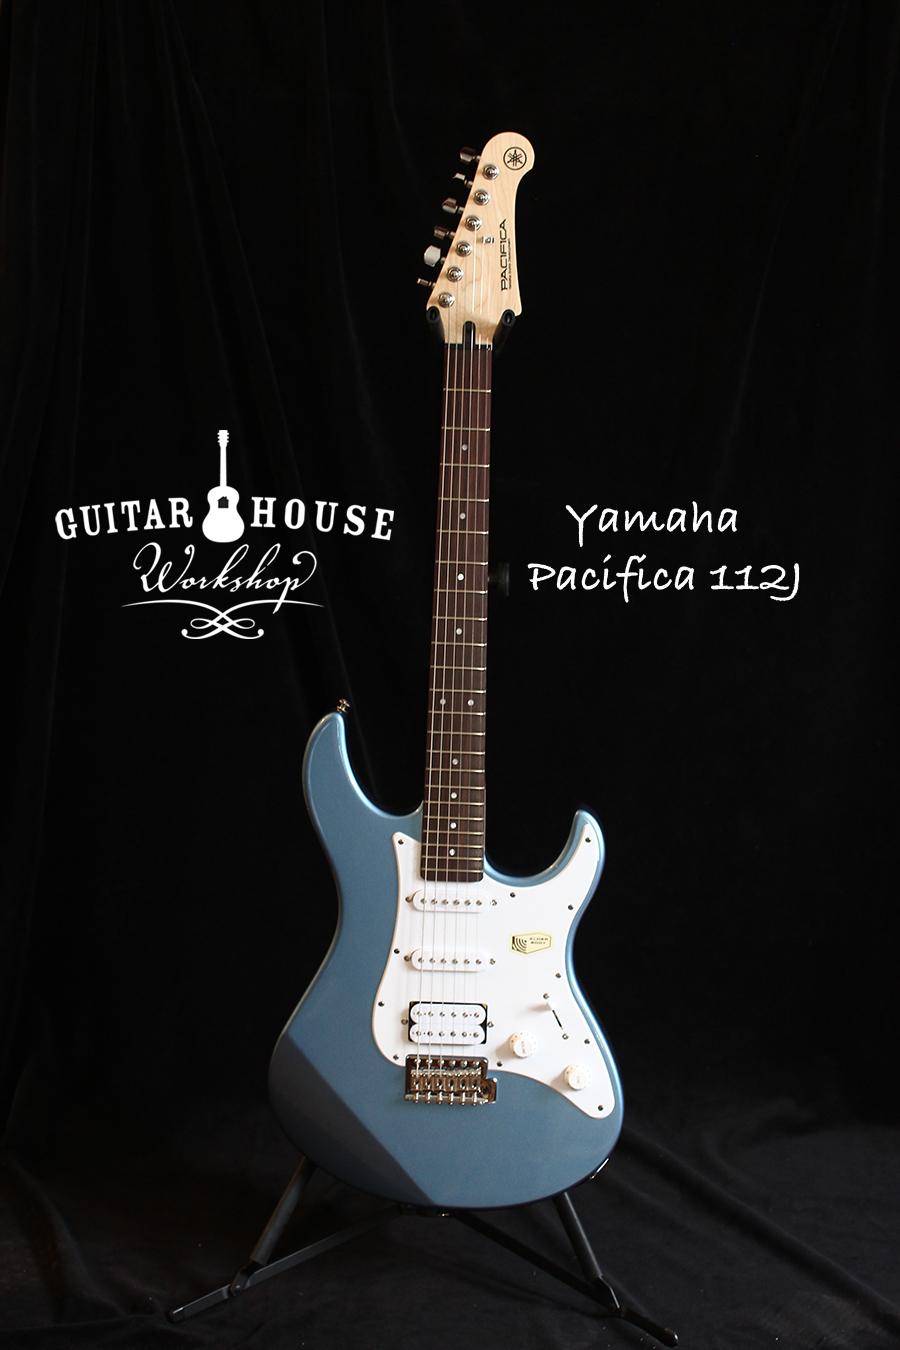 Yamaha Pacifica 112J  $225